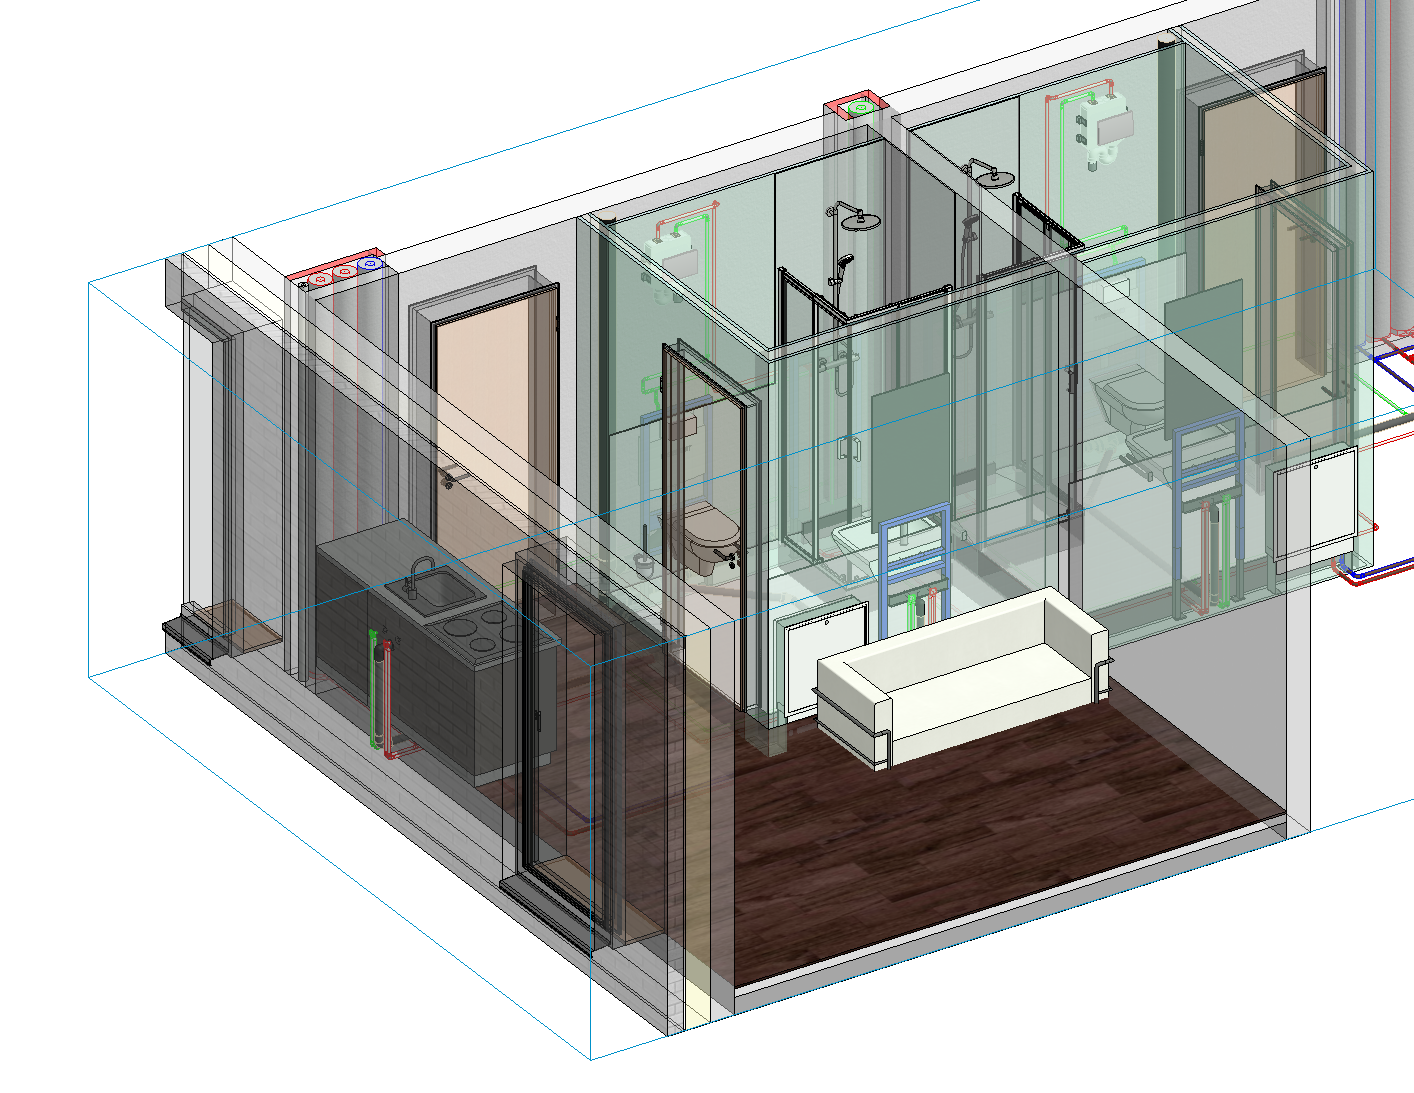 Hotel-Sanitaerinstallation-BIM-Planung.png